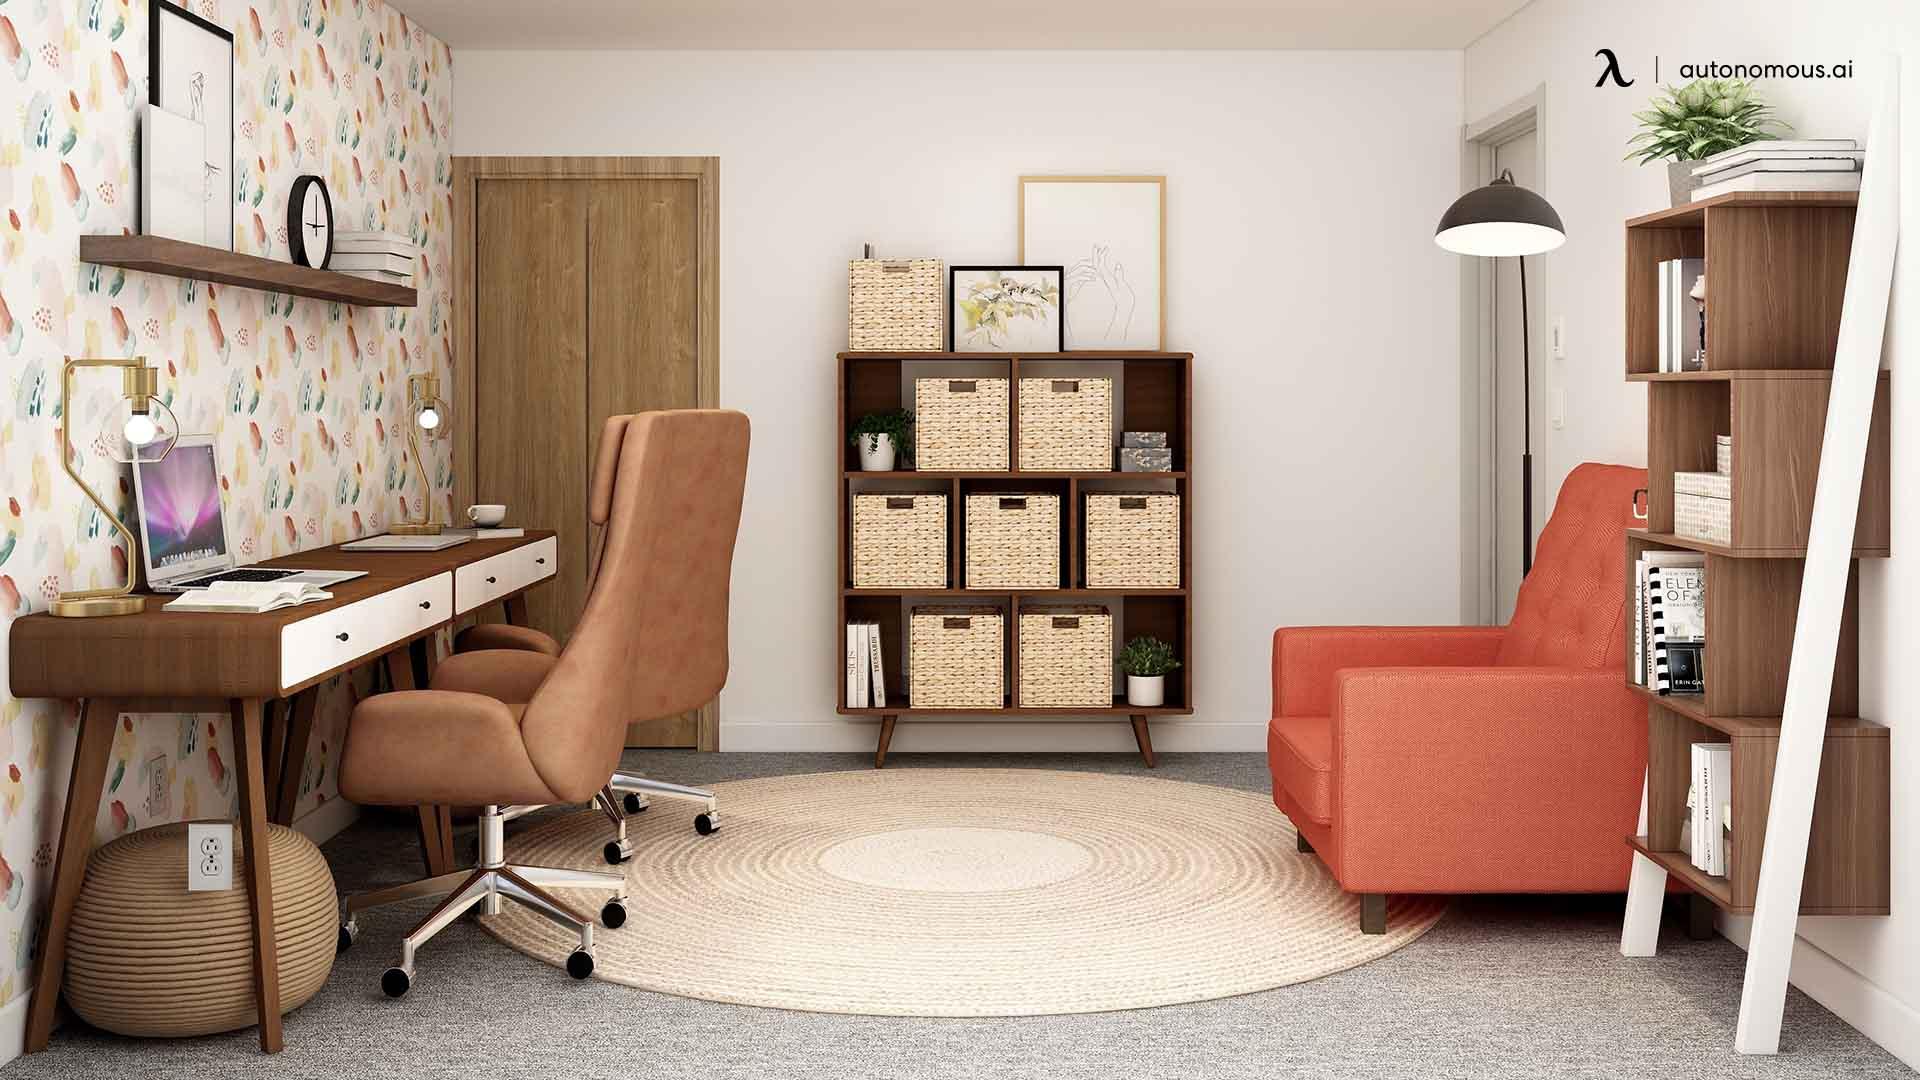 Benefits of Staying Organized